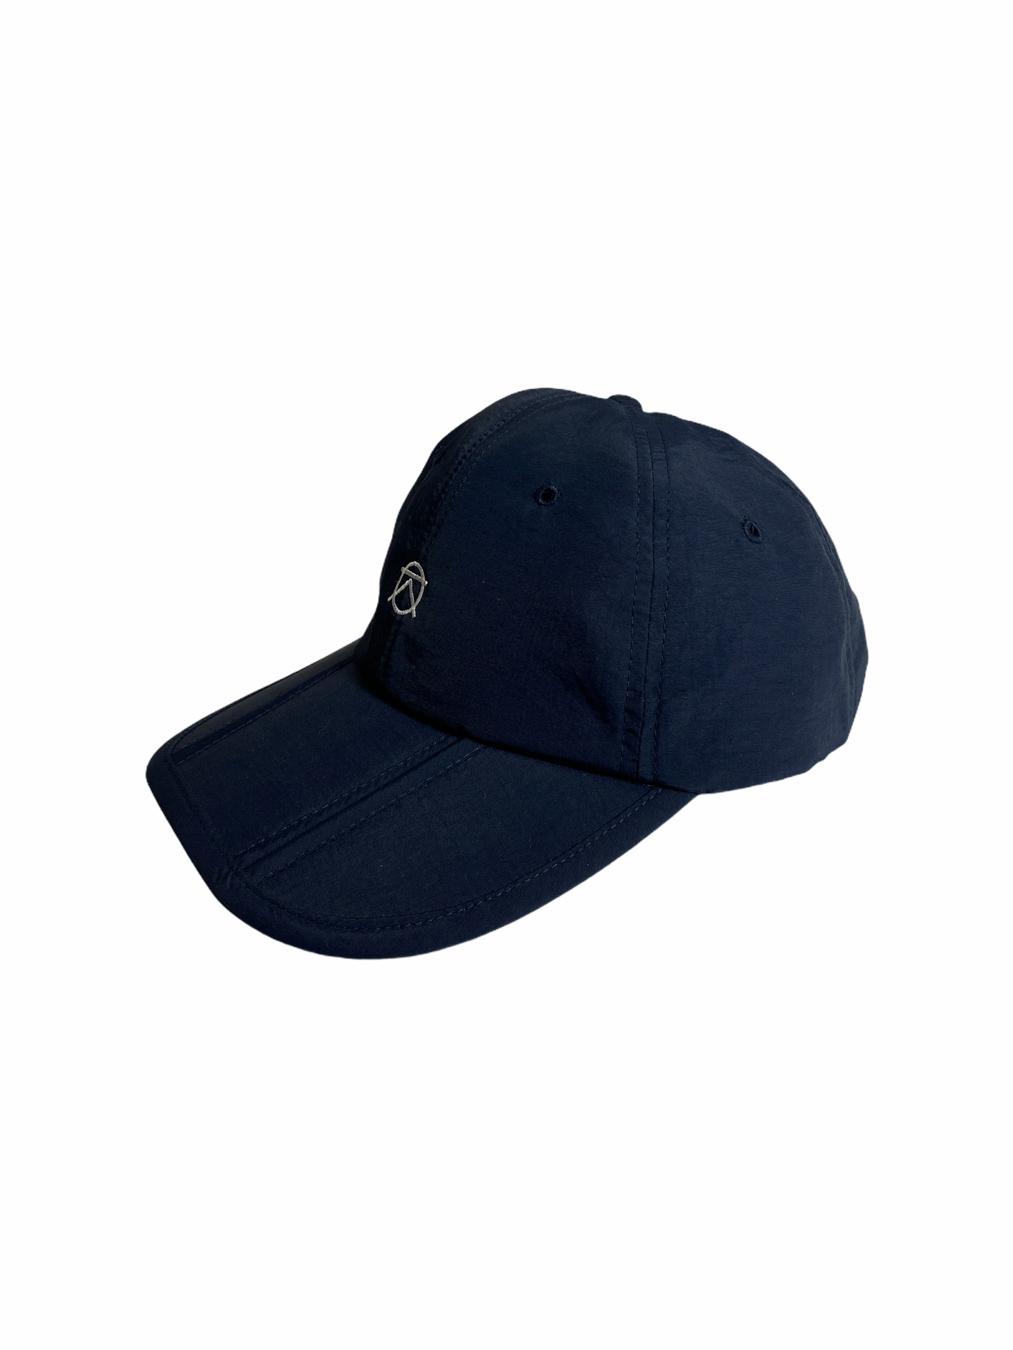 HAT folding cap (Navy)